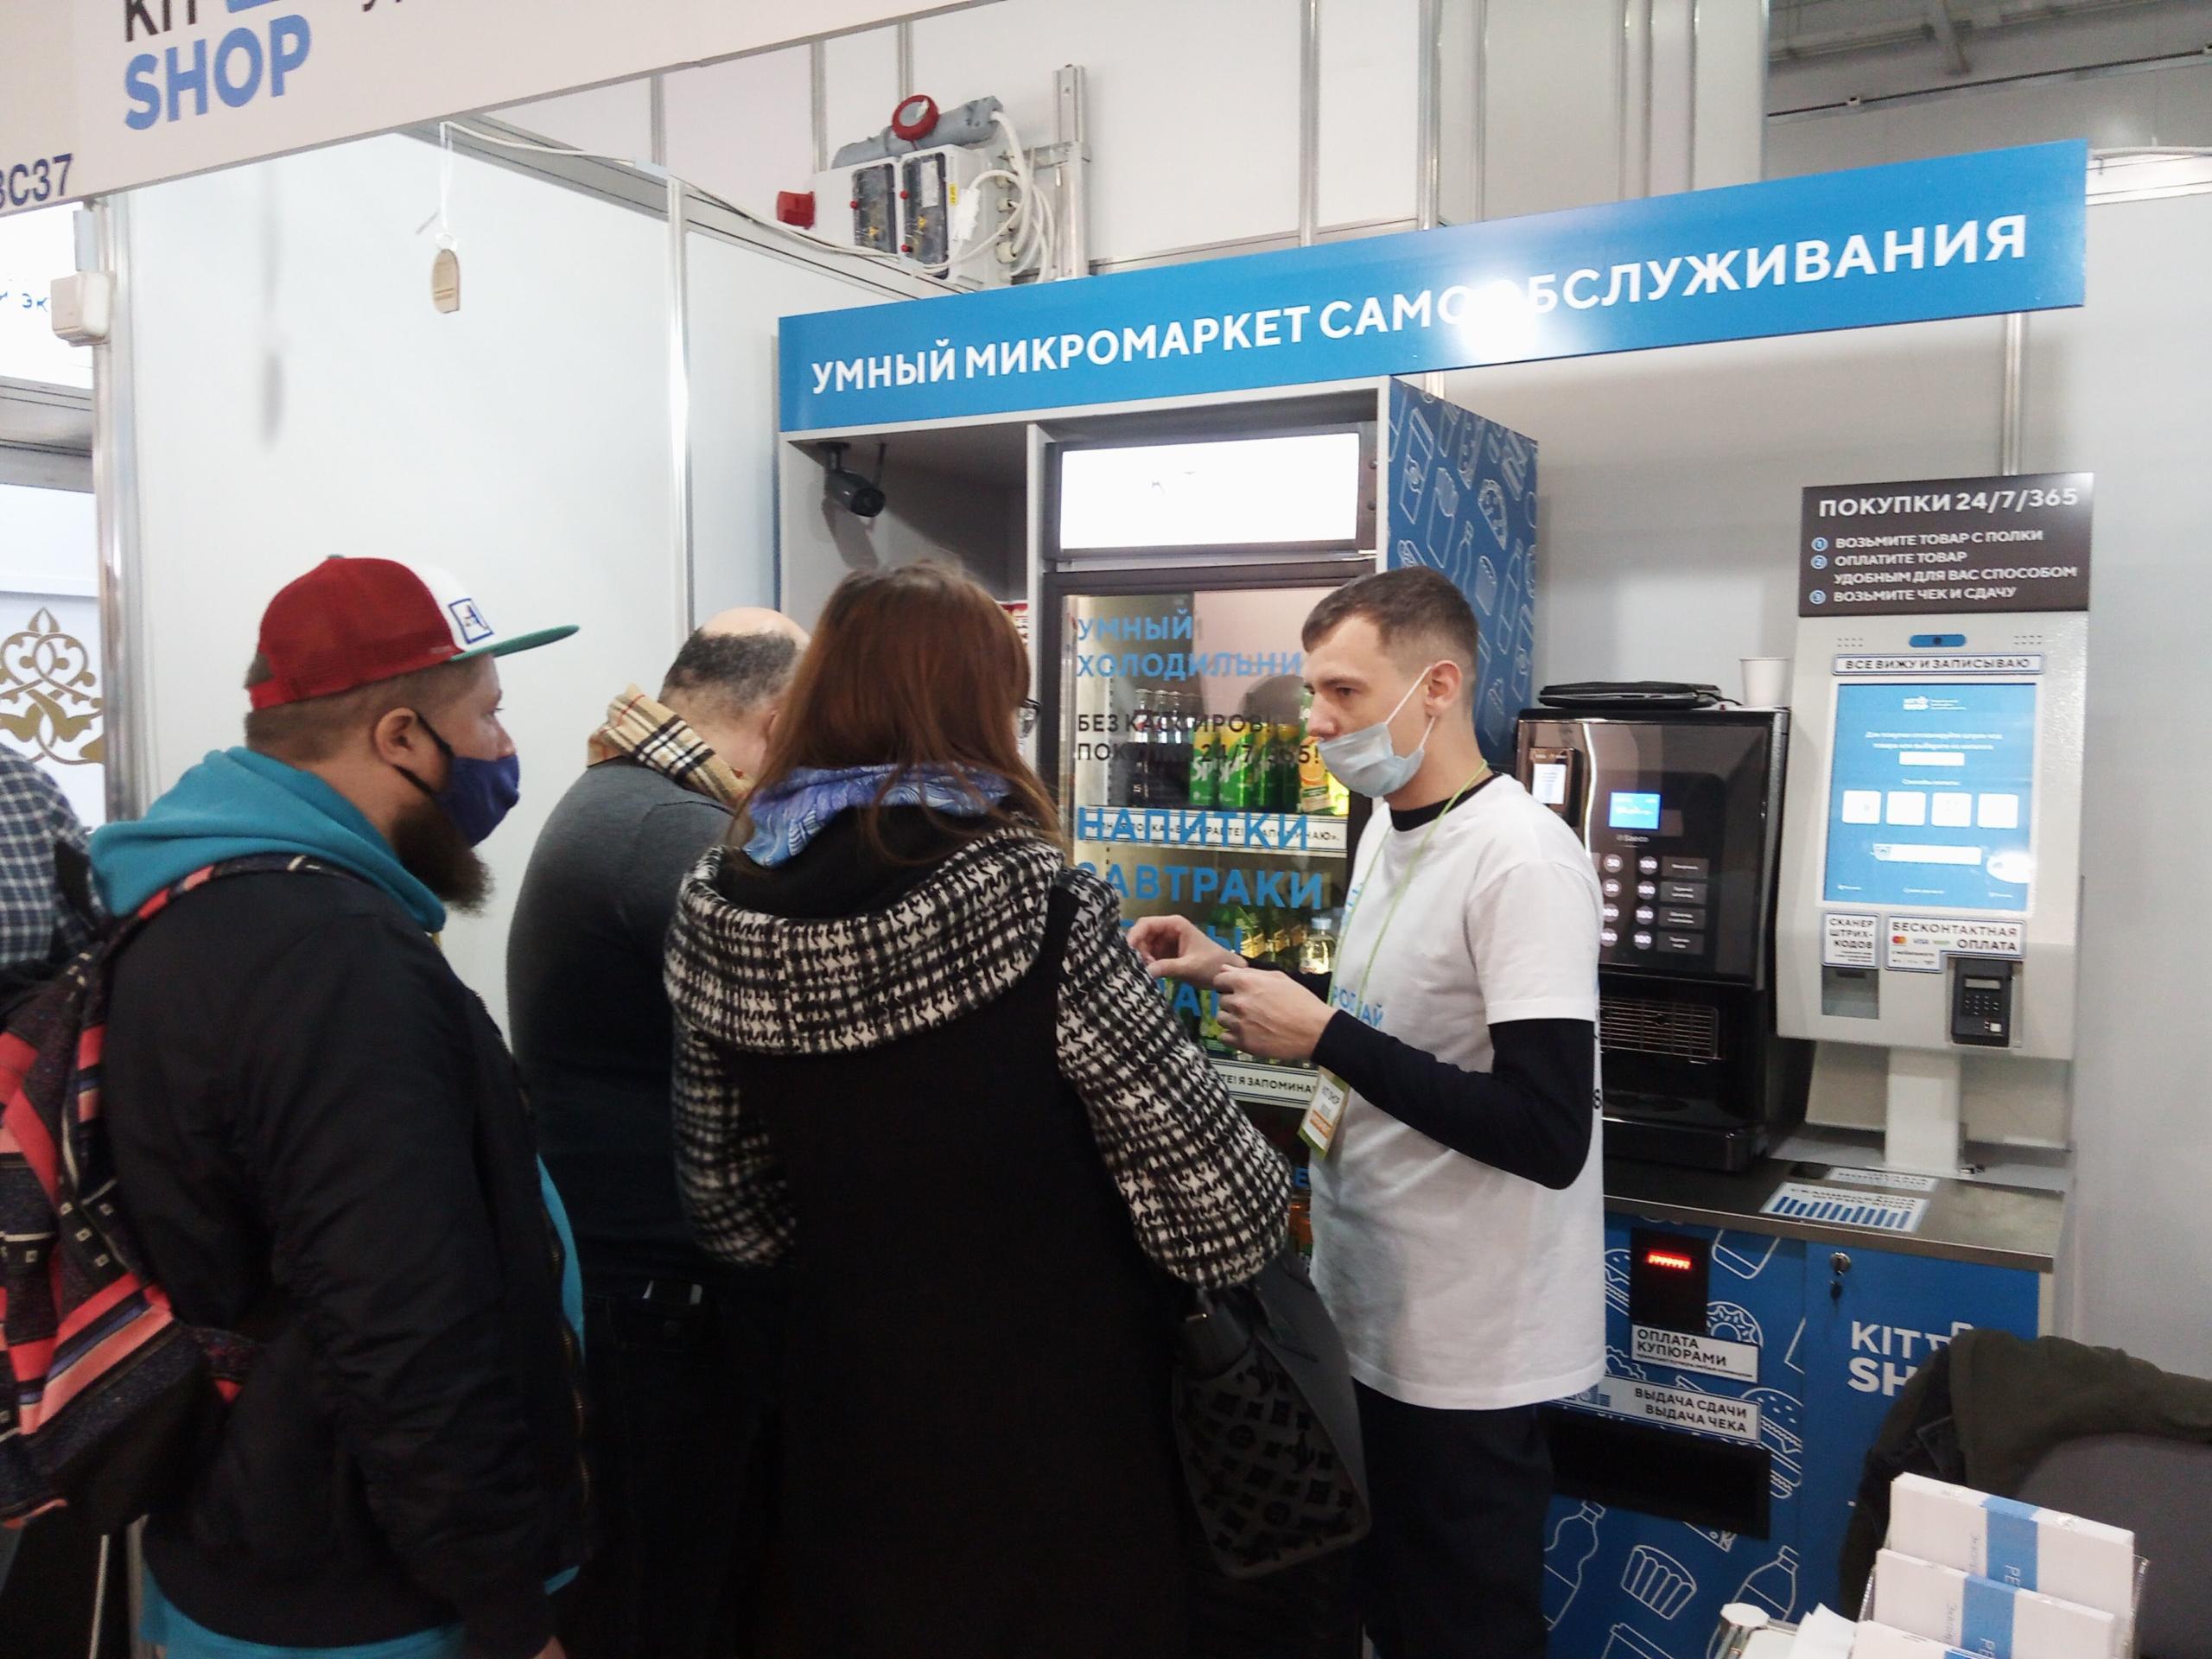 Проект KiT Vending и микромаркет Kit Shop на PIR EXPO 2020